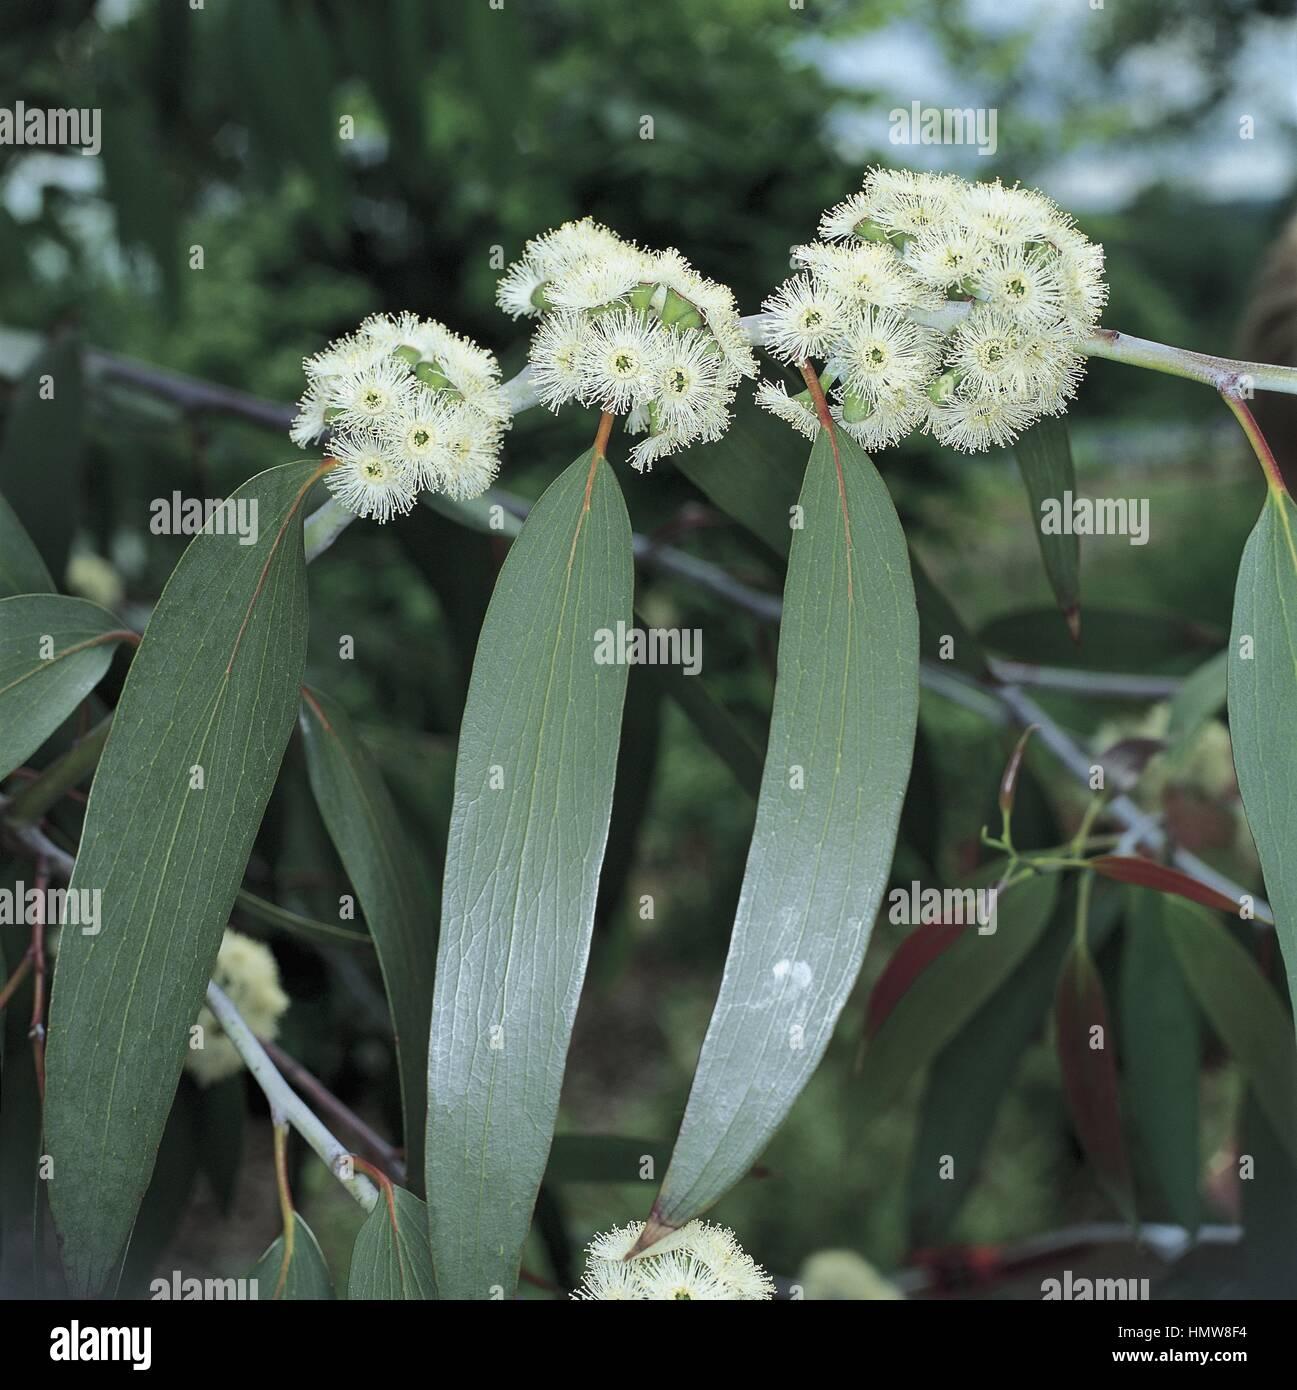 Botany - Myrtaceae. Snow gum (Eucalyptus pauciflora ssp. niphophila) - Stock Image